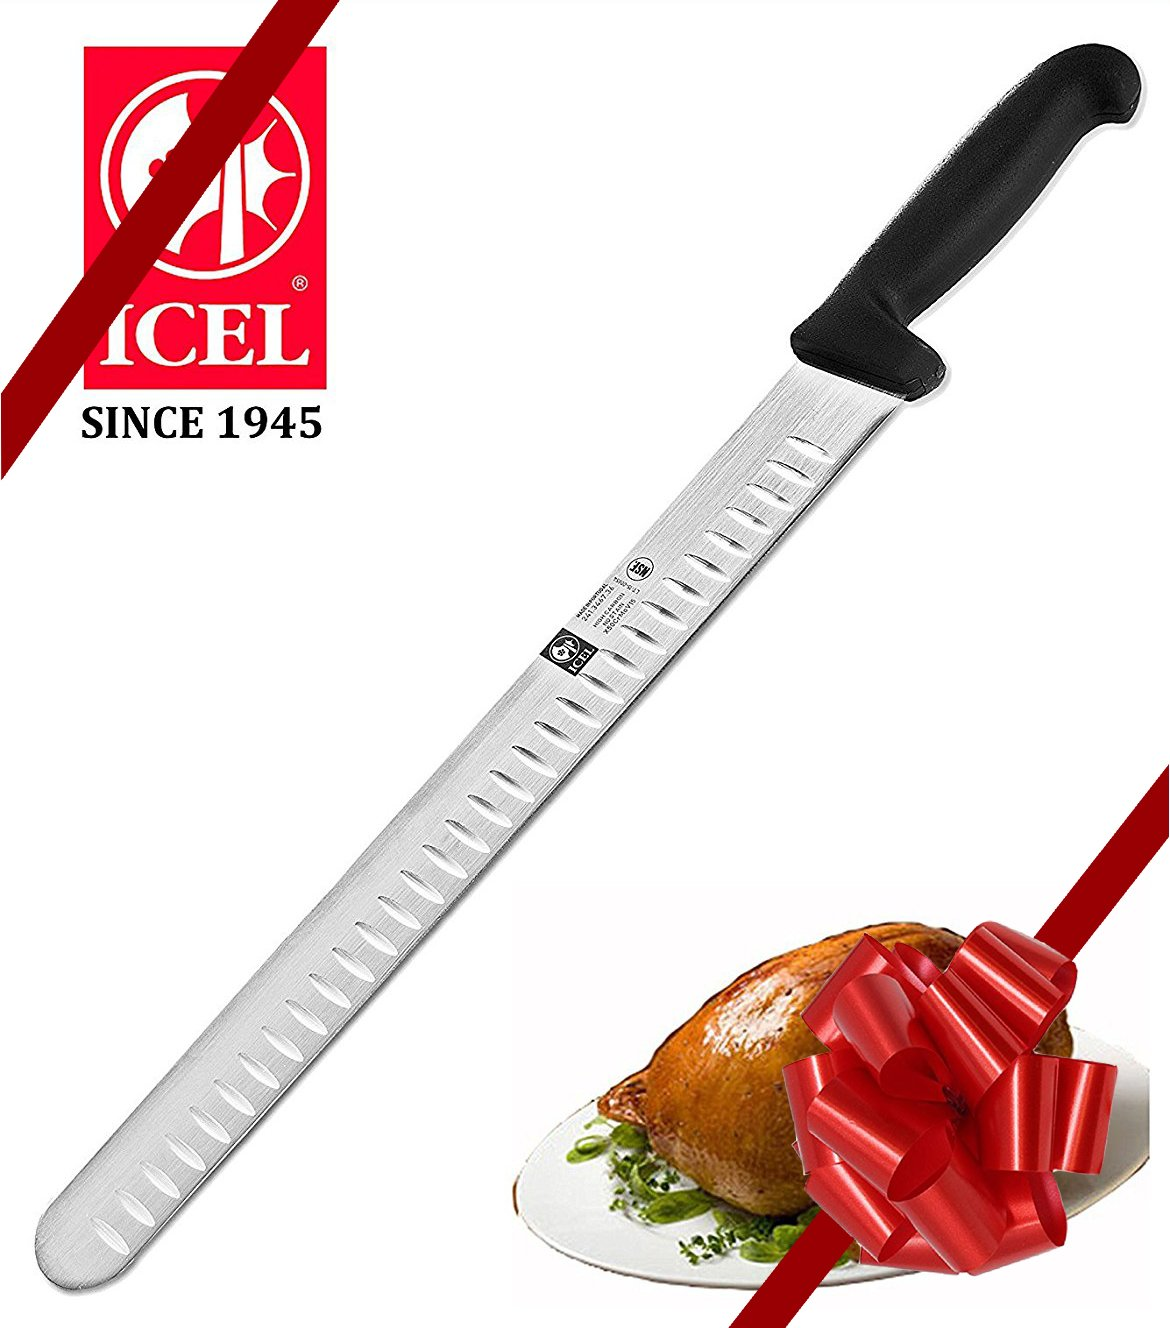 12-inch Blade Granton Edge, Turkey, Salmon, ham Slicer, Meat Slicing Knife. NSF Certified, German Steel,Knife sharpening instruction included, Best Knife to Slice Large Roast and Whole Turkey.